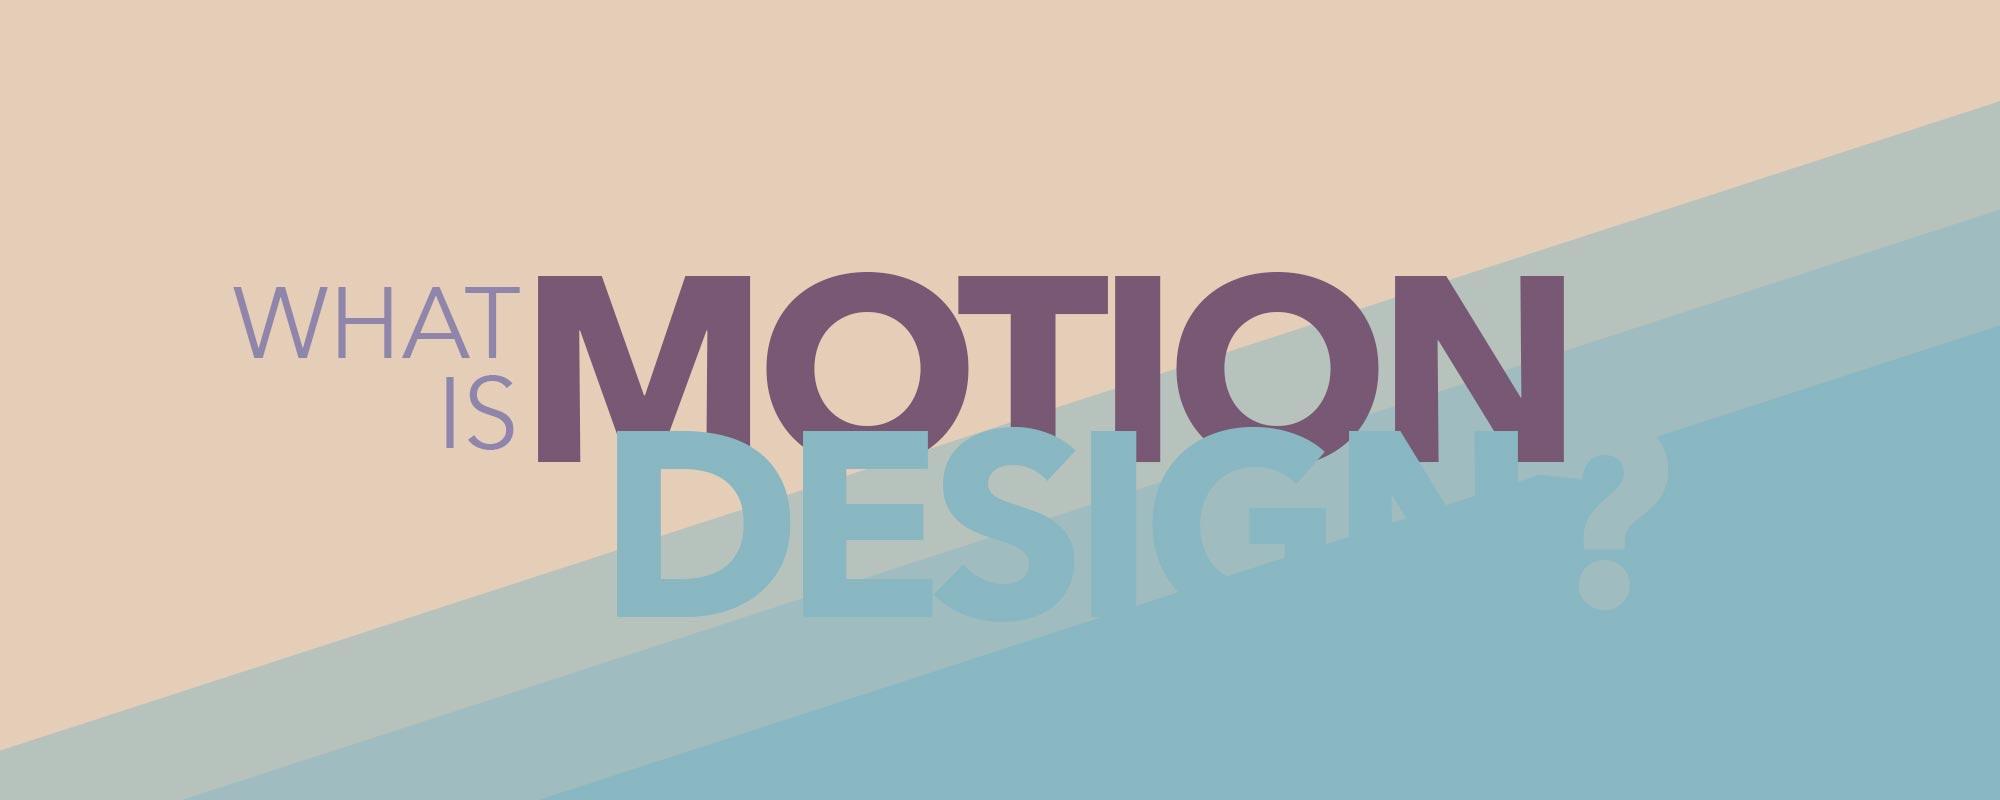 Motion design на личном опыте | skvot